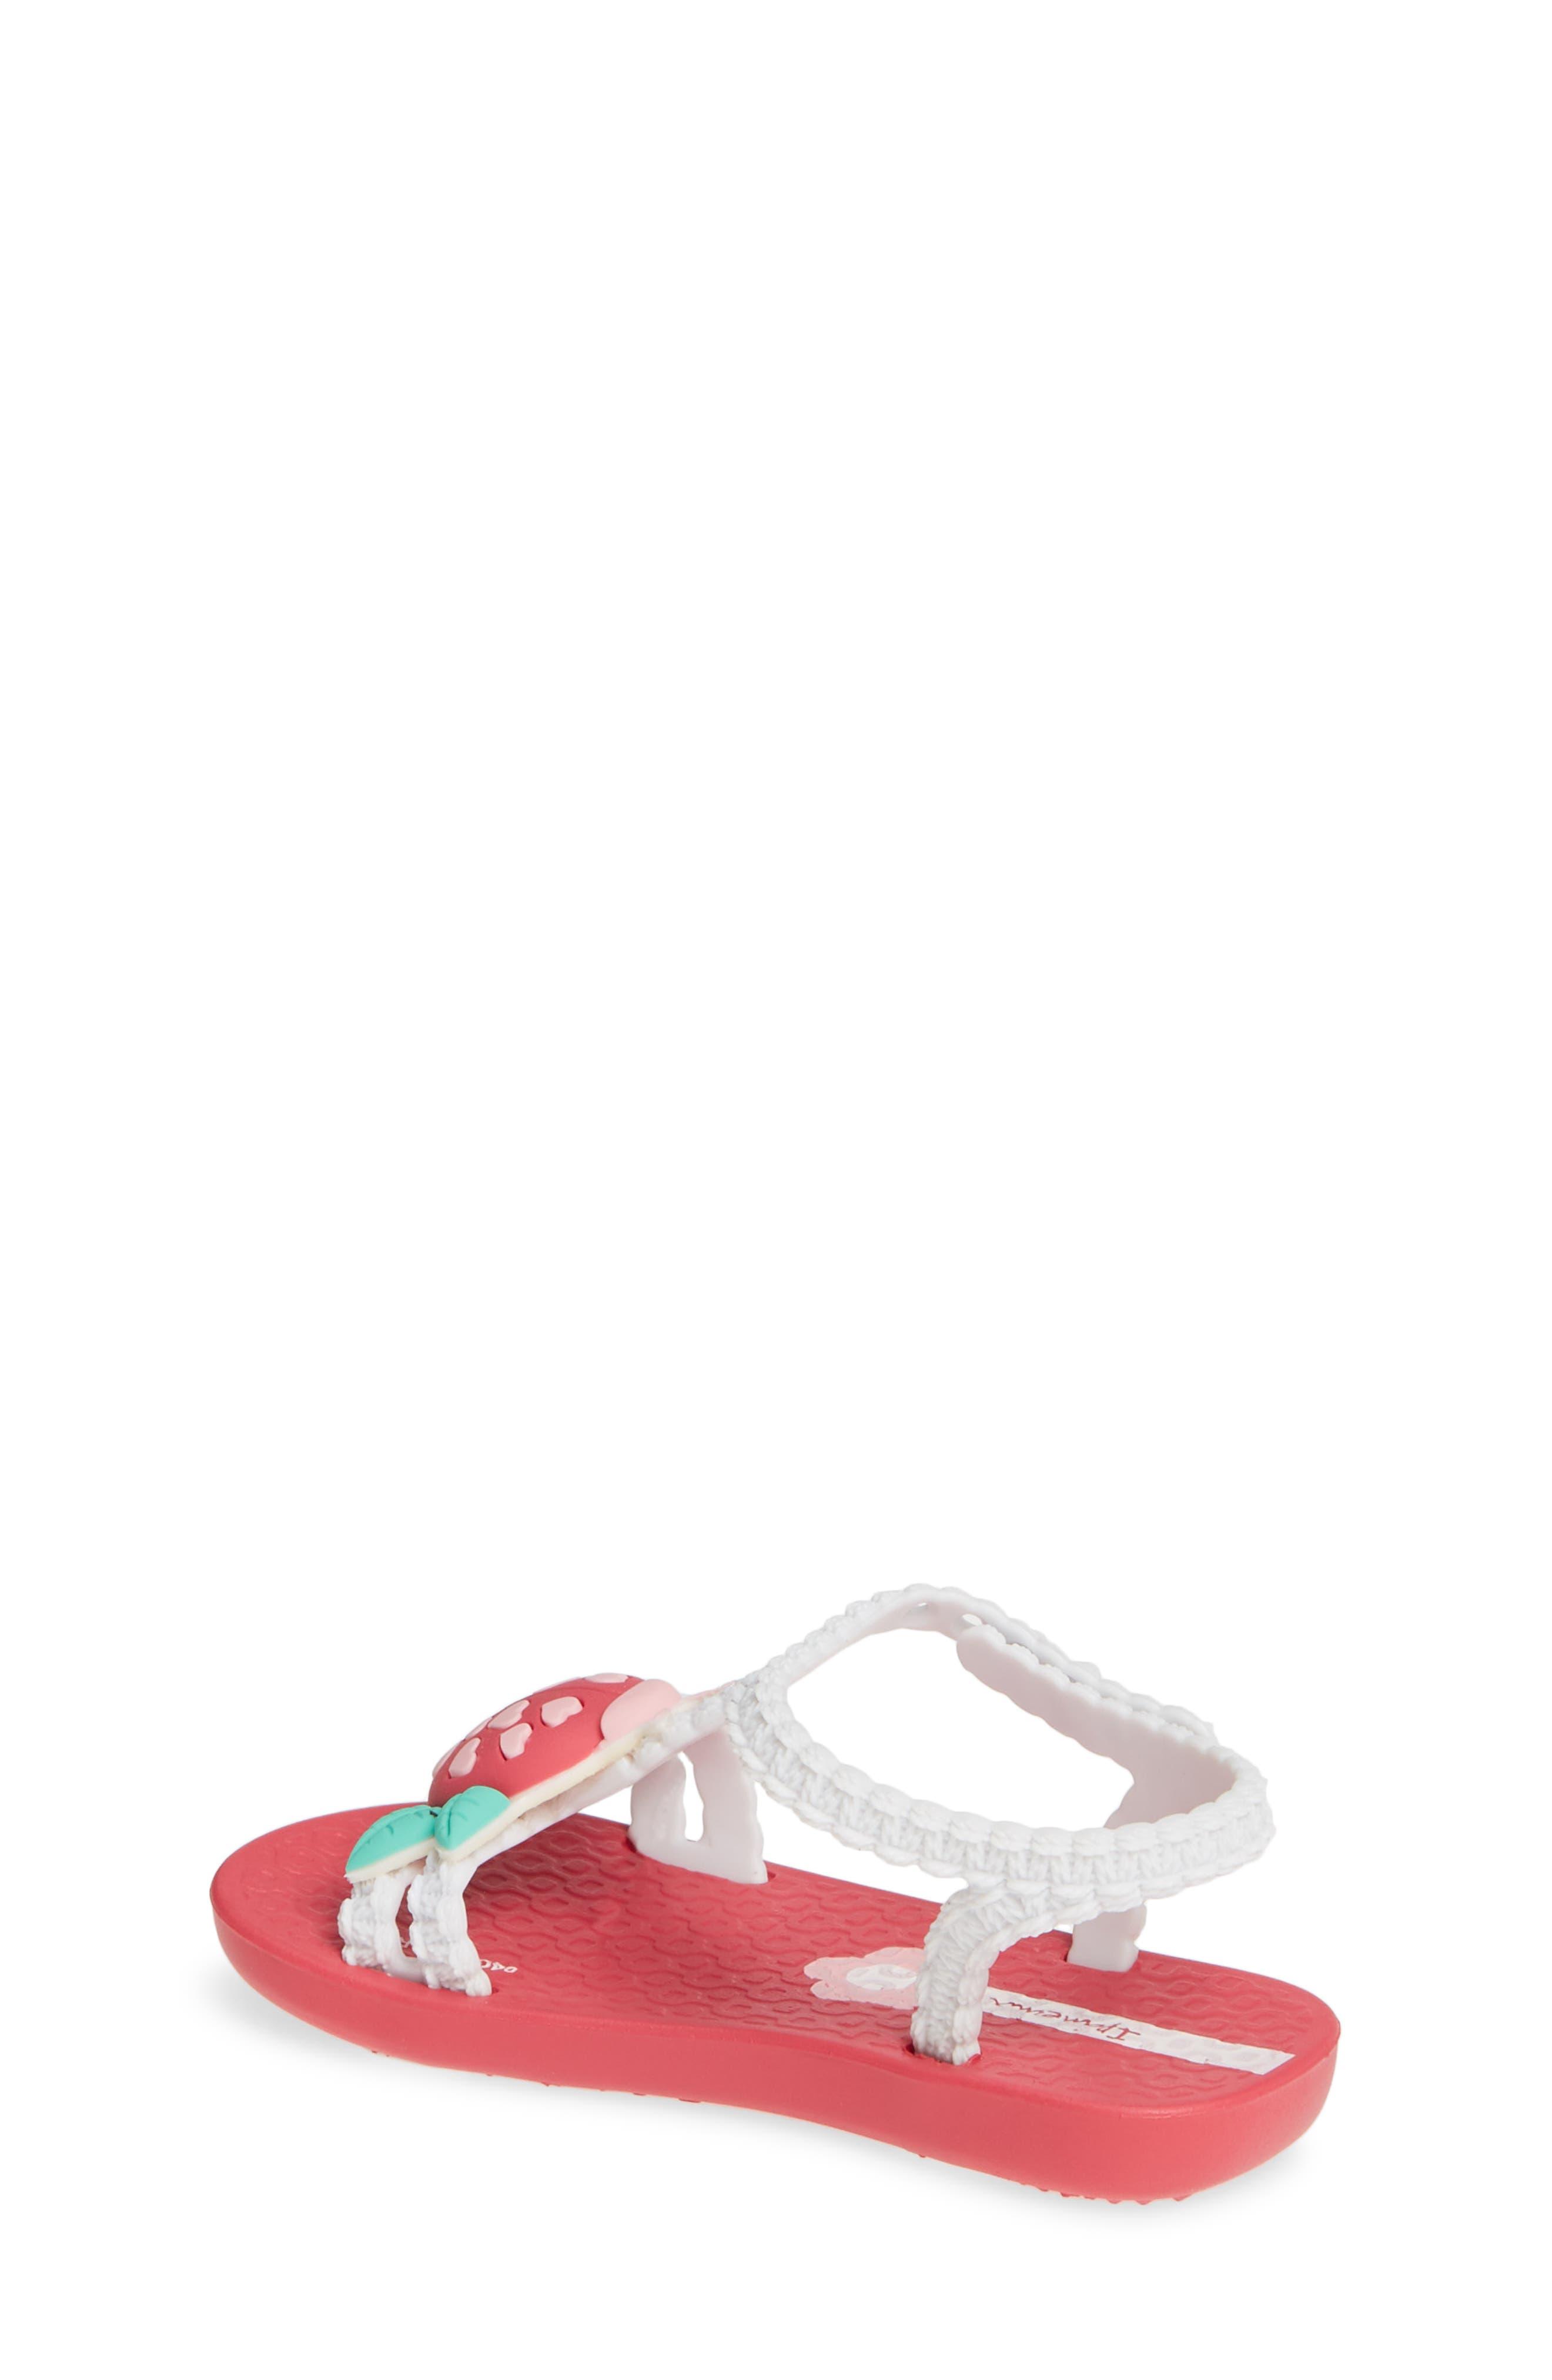 IPANEMA, Buggy Baby Sandal, Alternate thumbnail 2, color, PINK/ WHITE